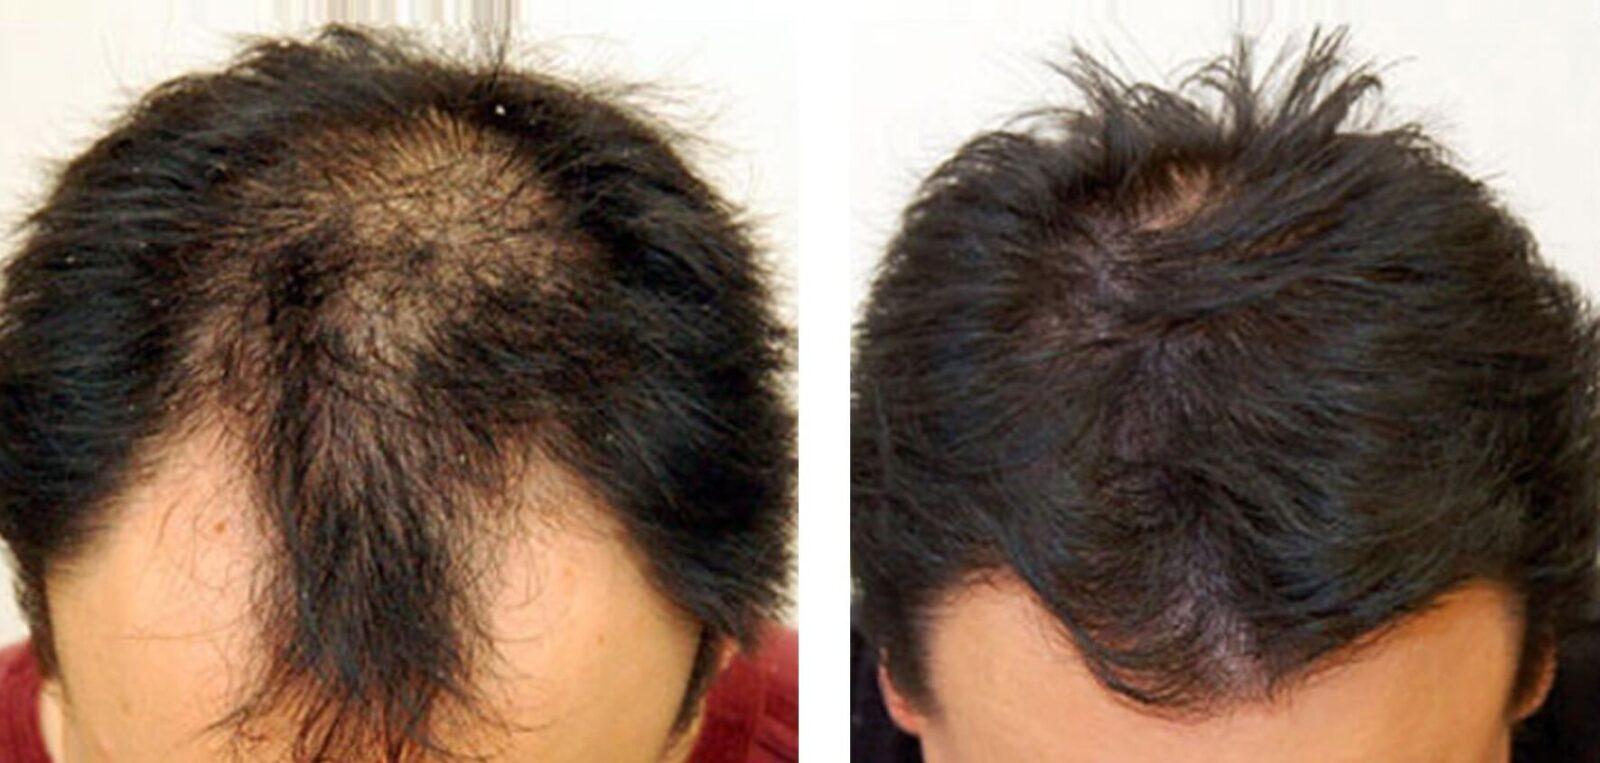 Фото До и После пересадки волос - фото 6